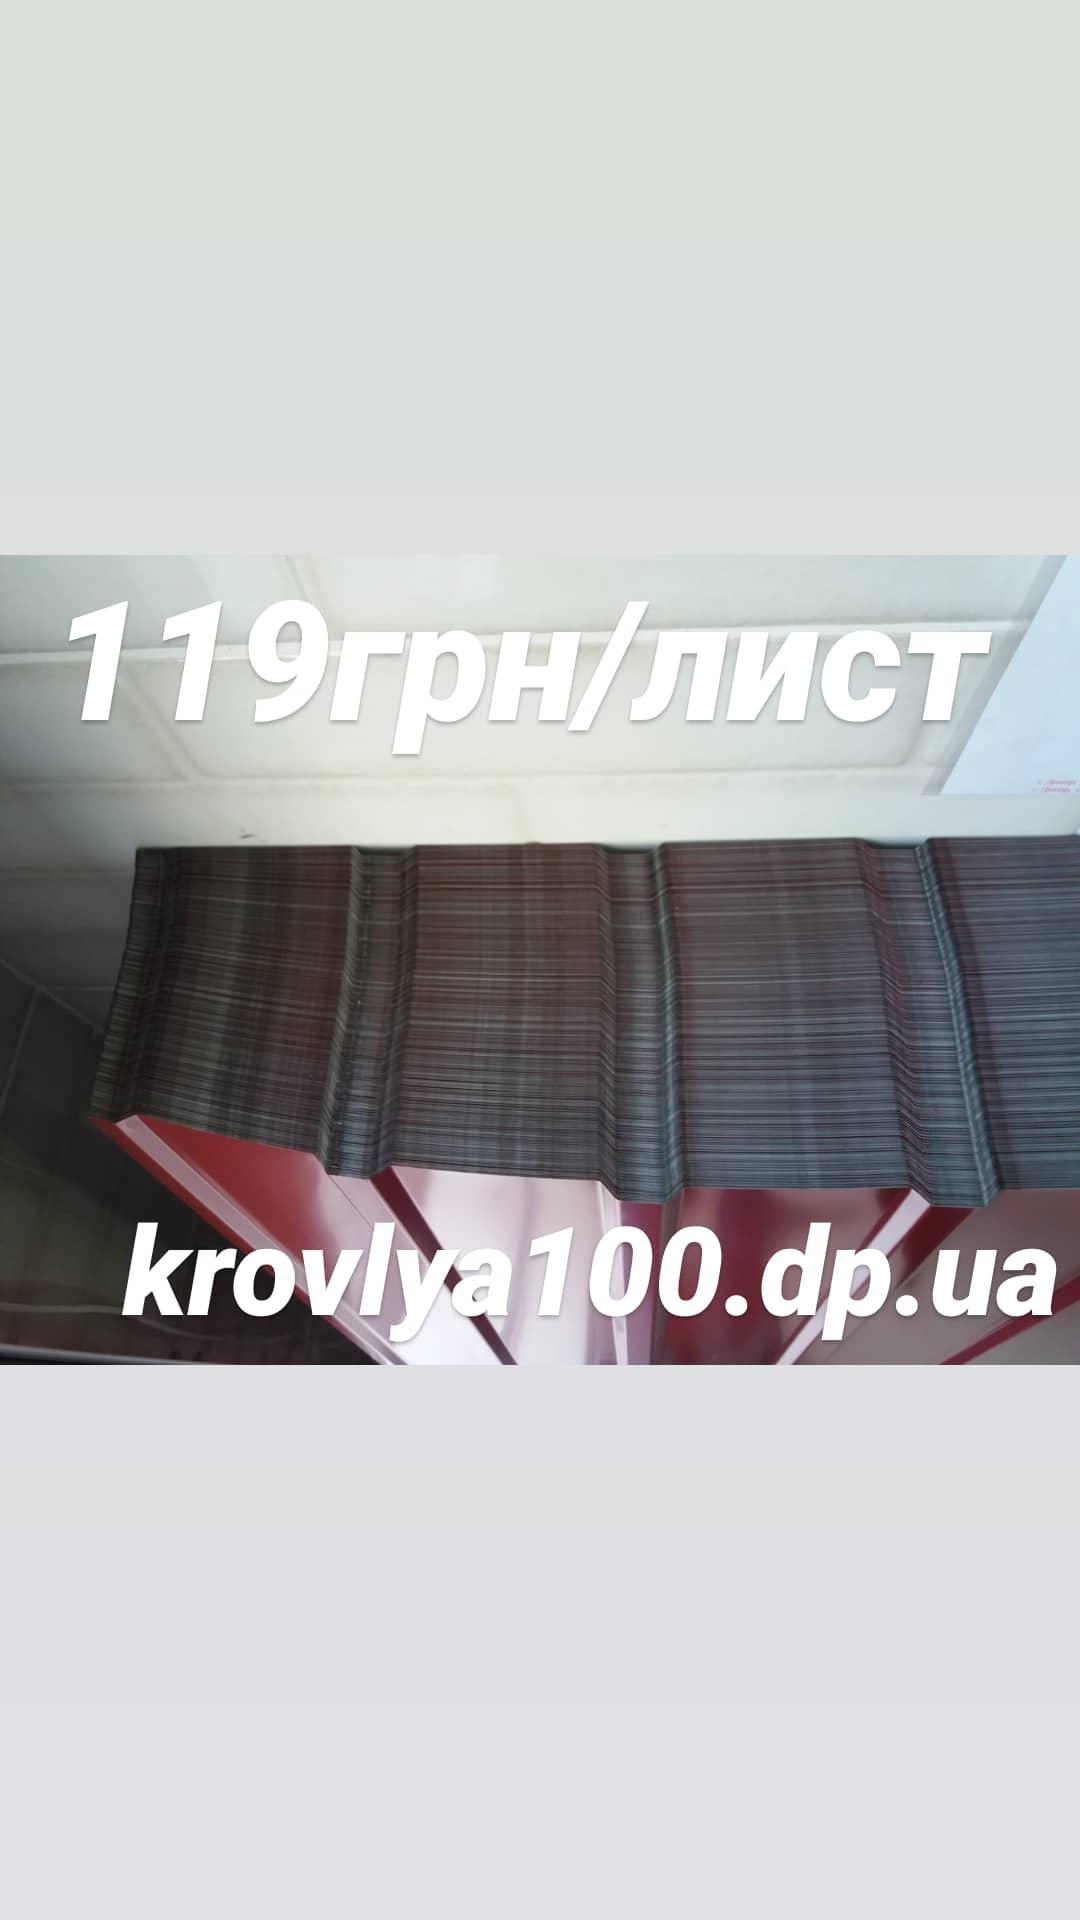 IMG_20200302_121129_688